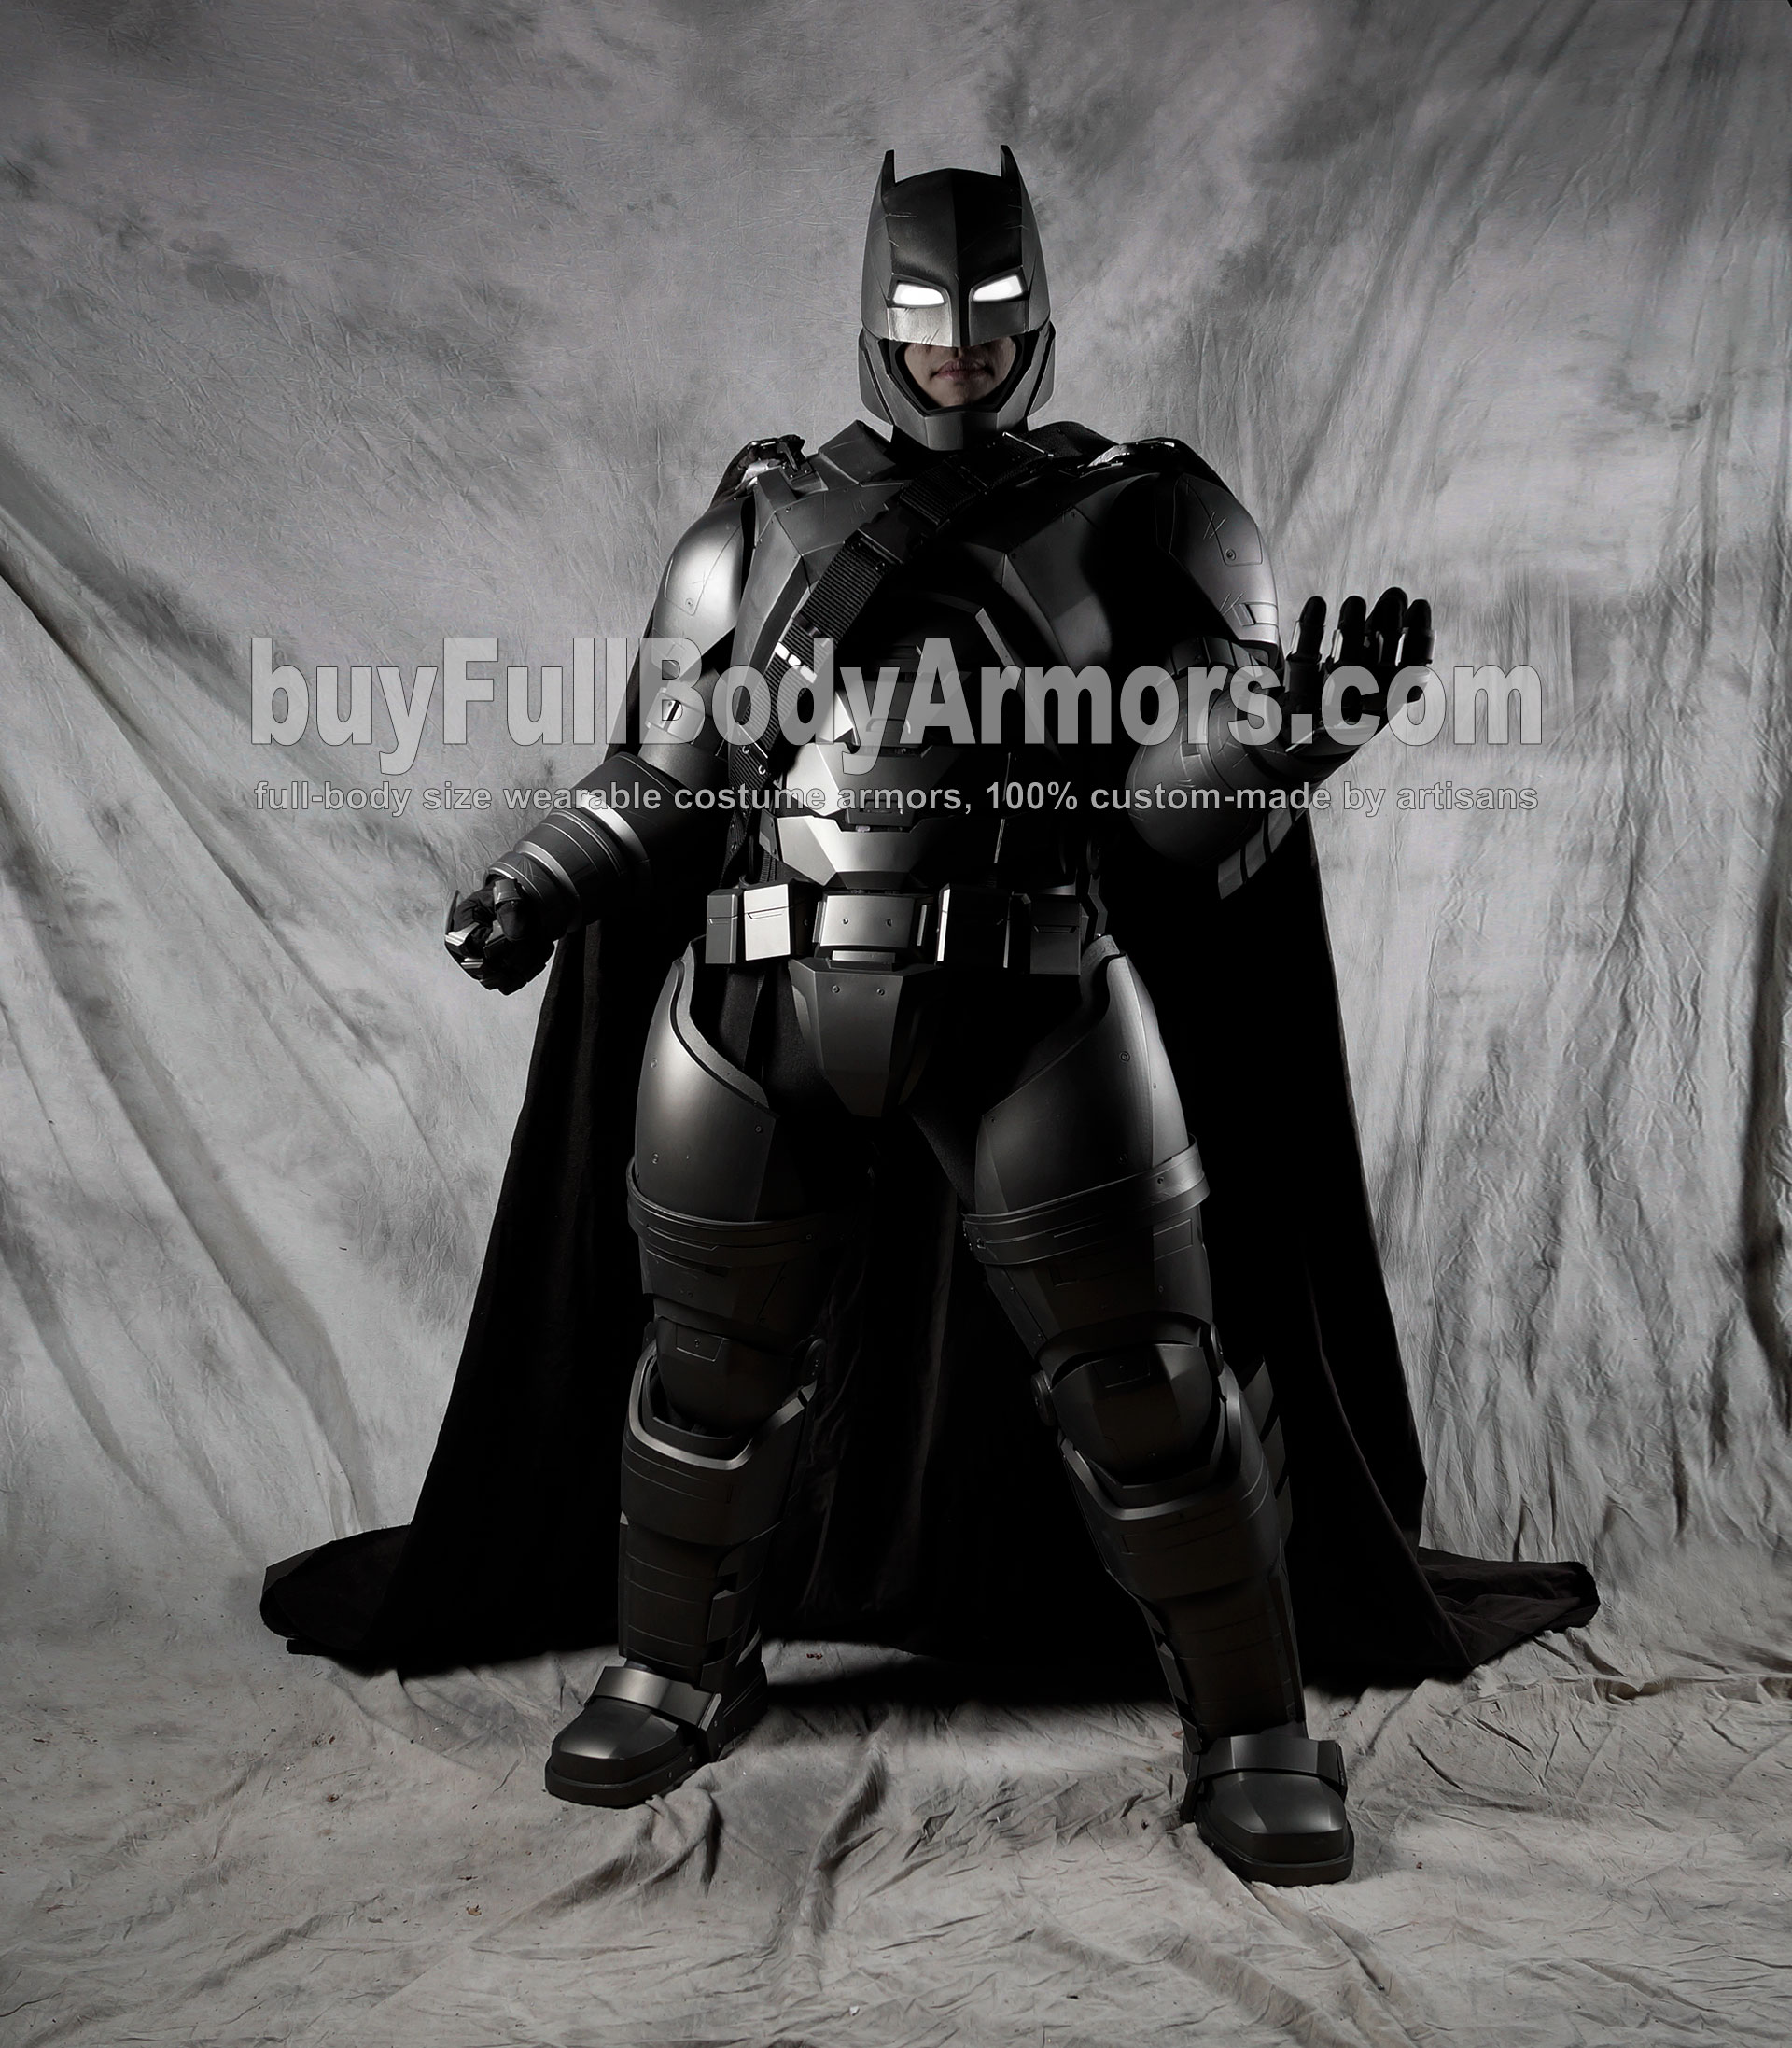 The Wearable Armored Batsuit (Batman armor suit costume) front power